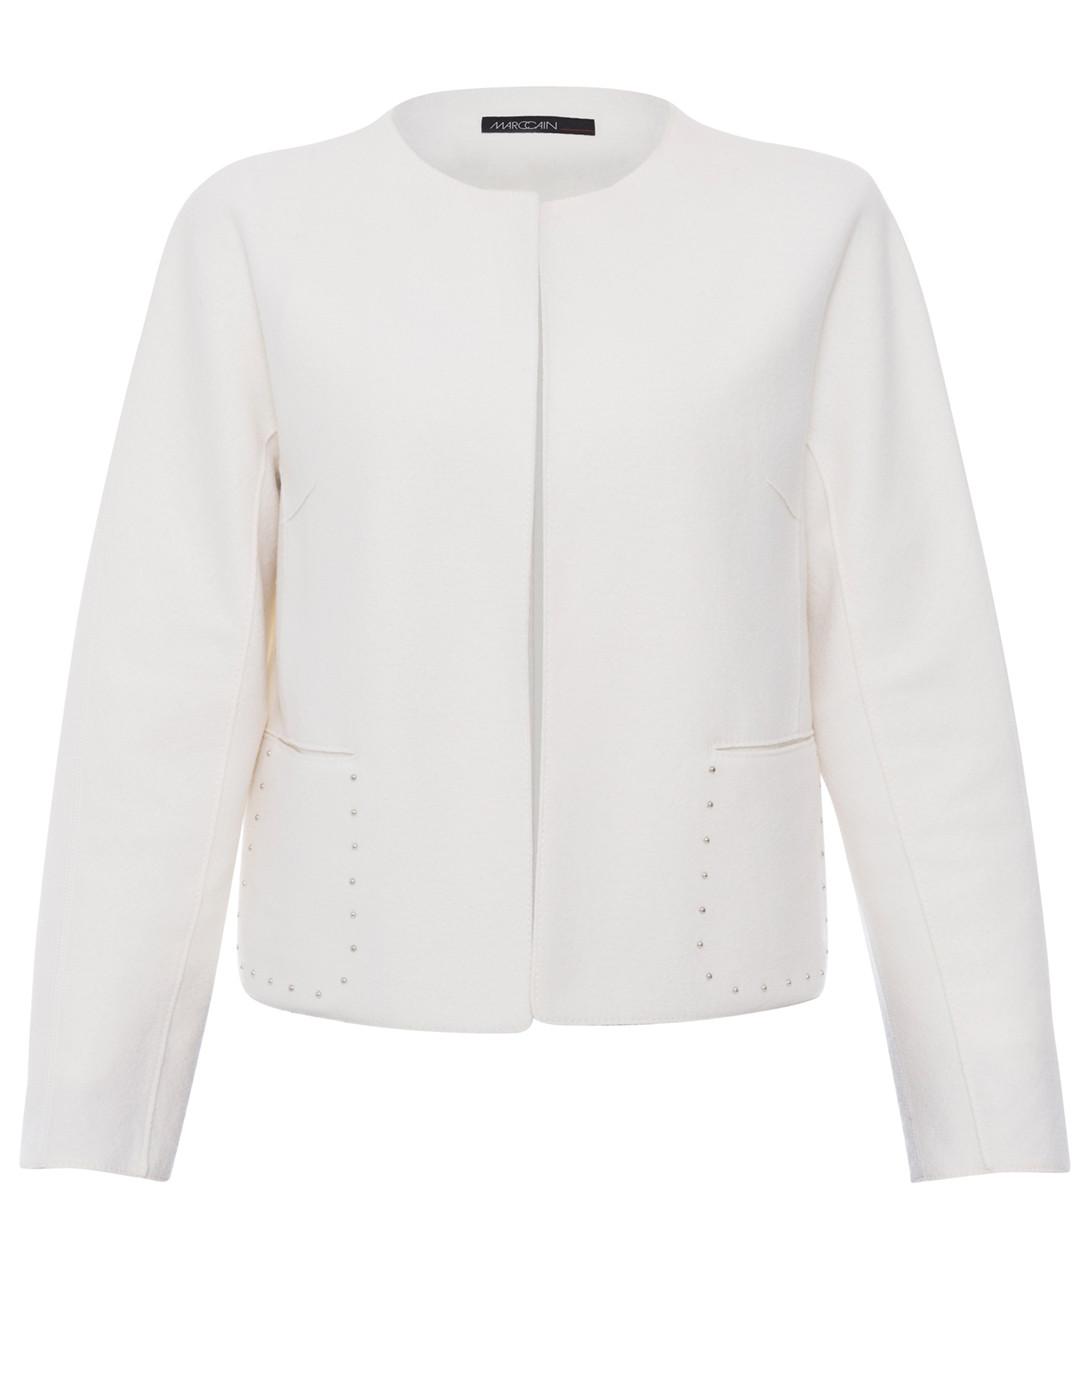 df92b7a4cc58 White Short Wool Jacket   Marc Cain   Halsbrook